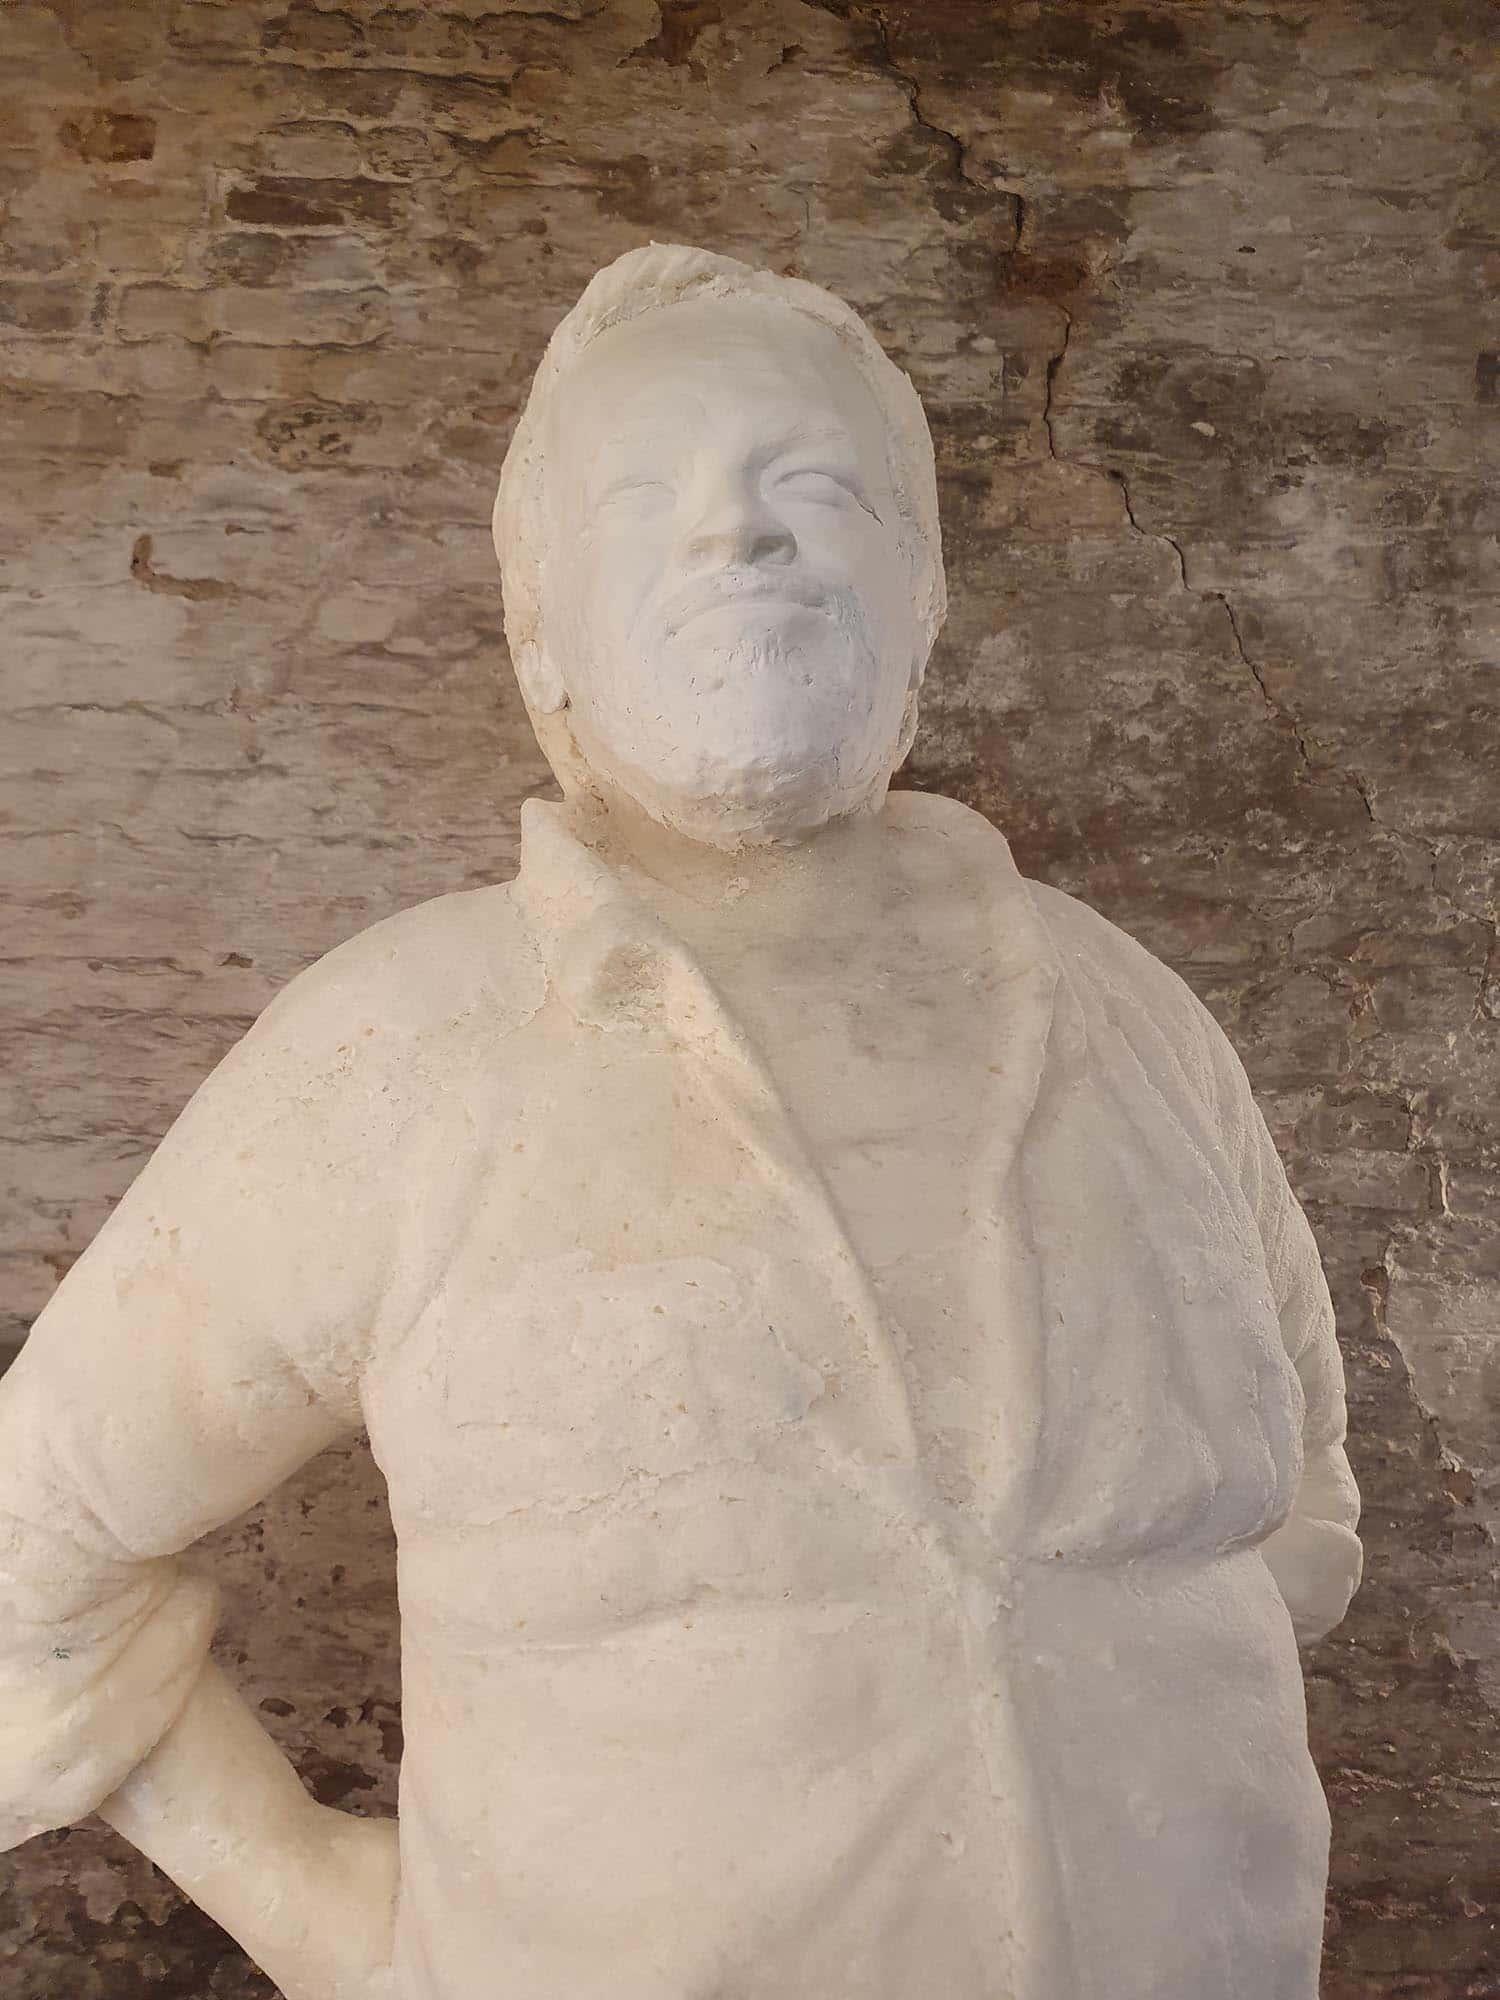 Aktueller Stand der Bud Spencer Statue per 19.07.2020